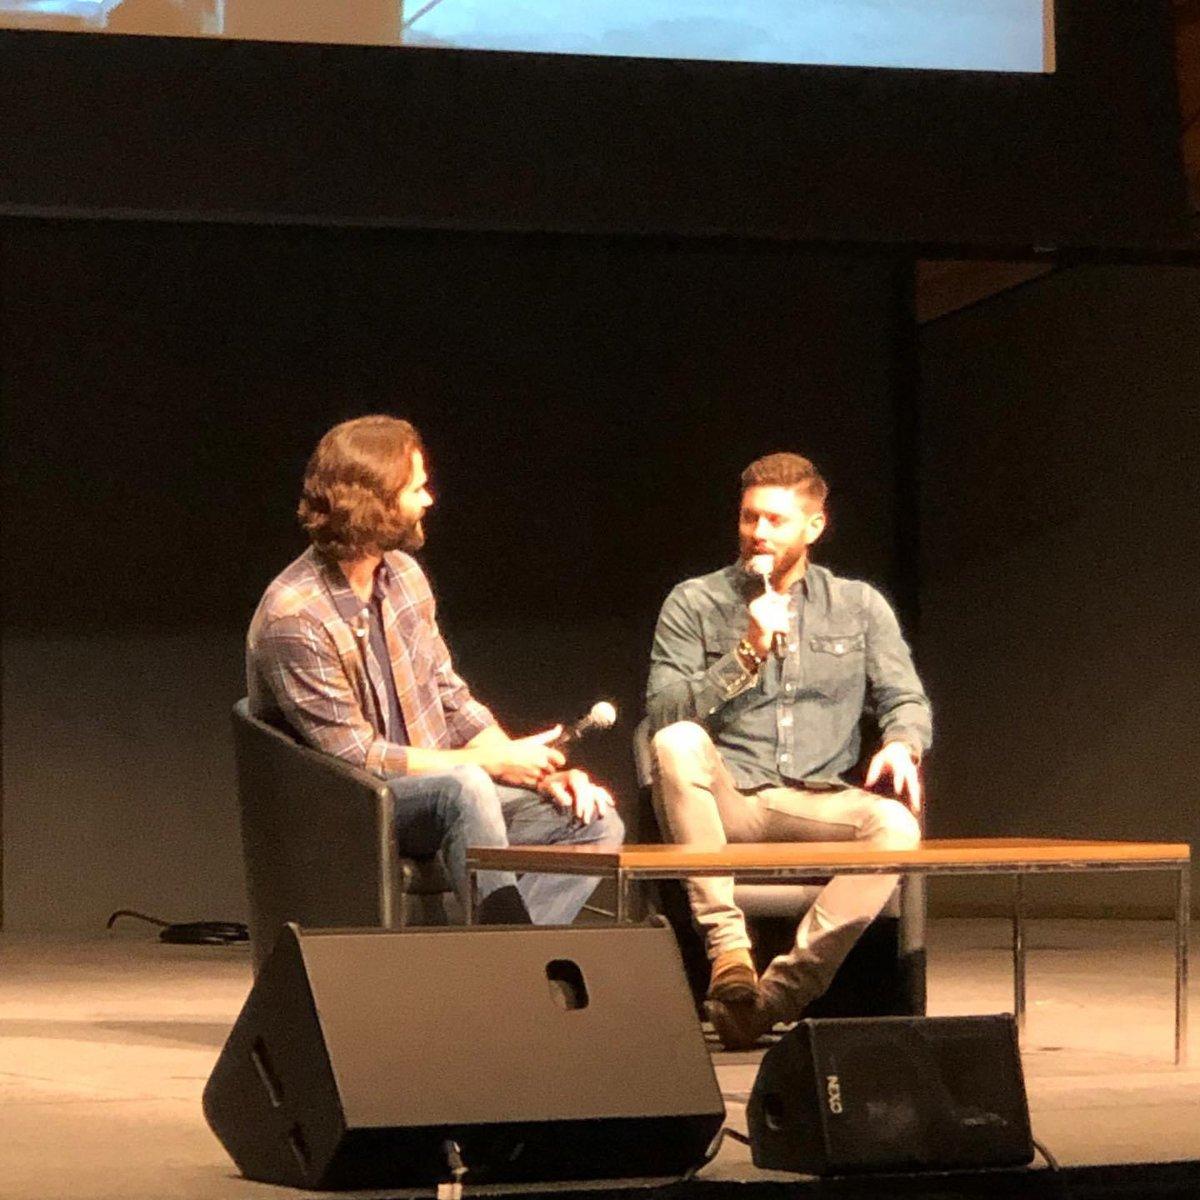 One year ago today I met @JensenAckles @jarpad @TheHUBBUB<br>http://pic.twitter.com/Xr0QXu8wJ2